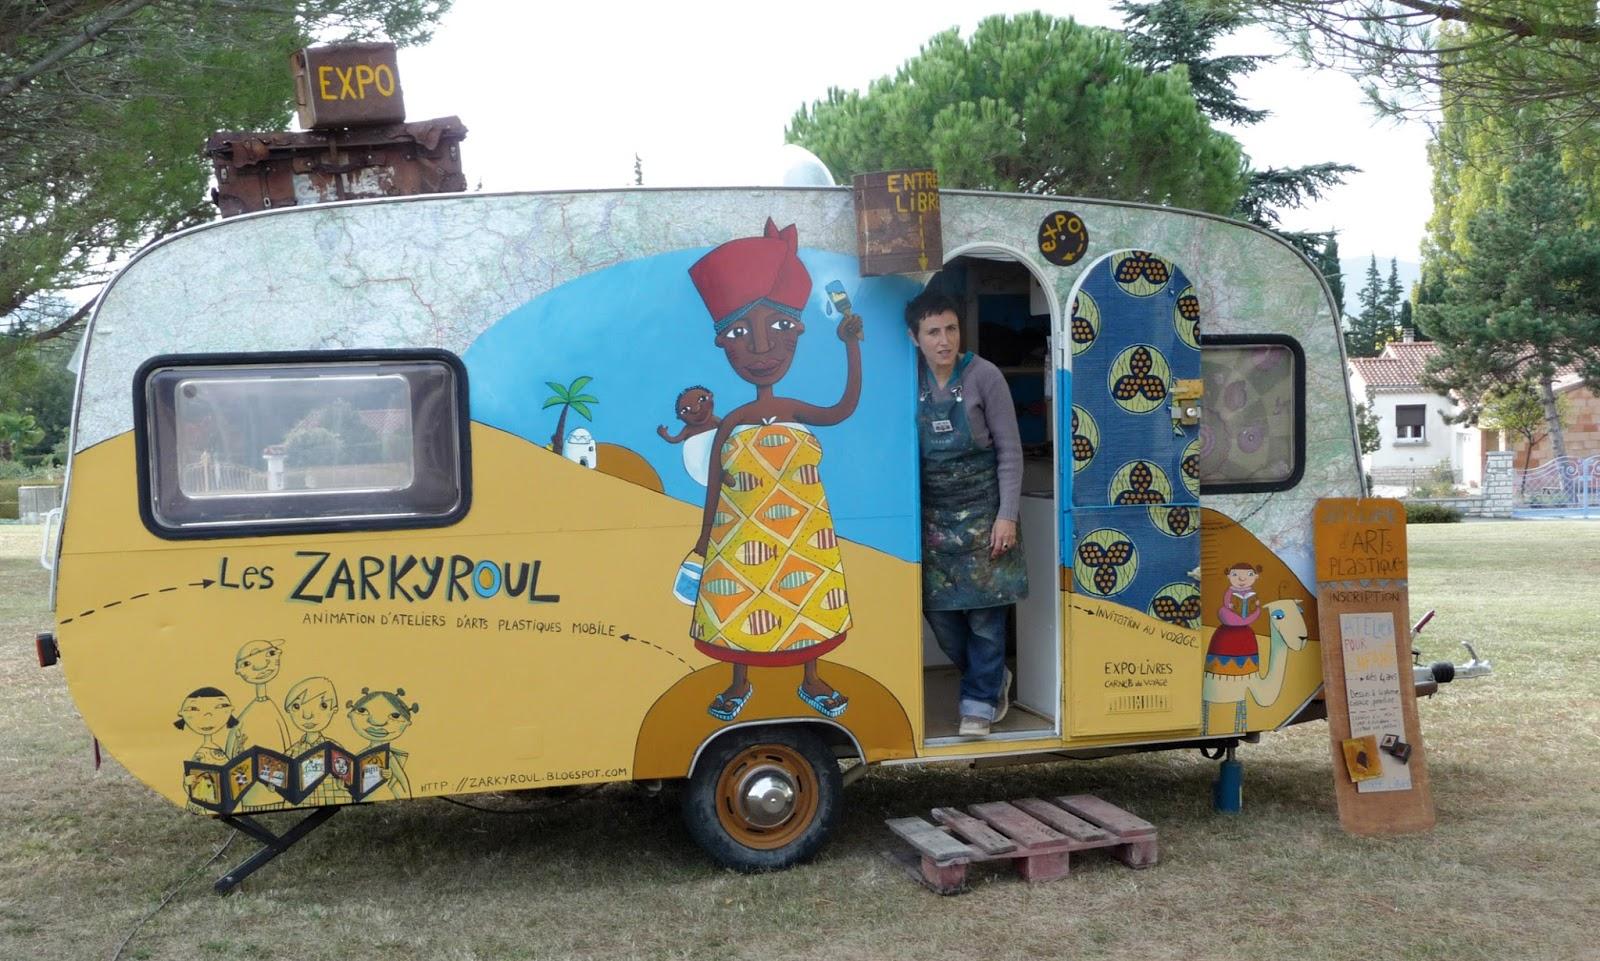 Caravane Decoree ~ Francedesign.co